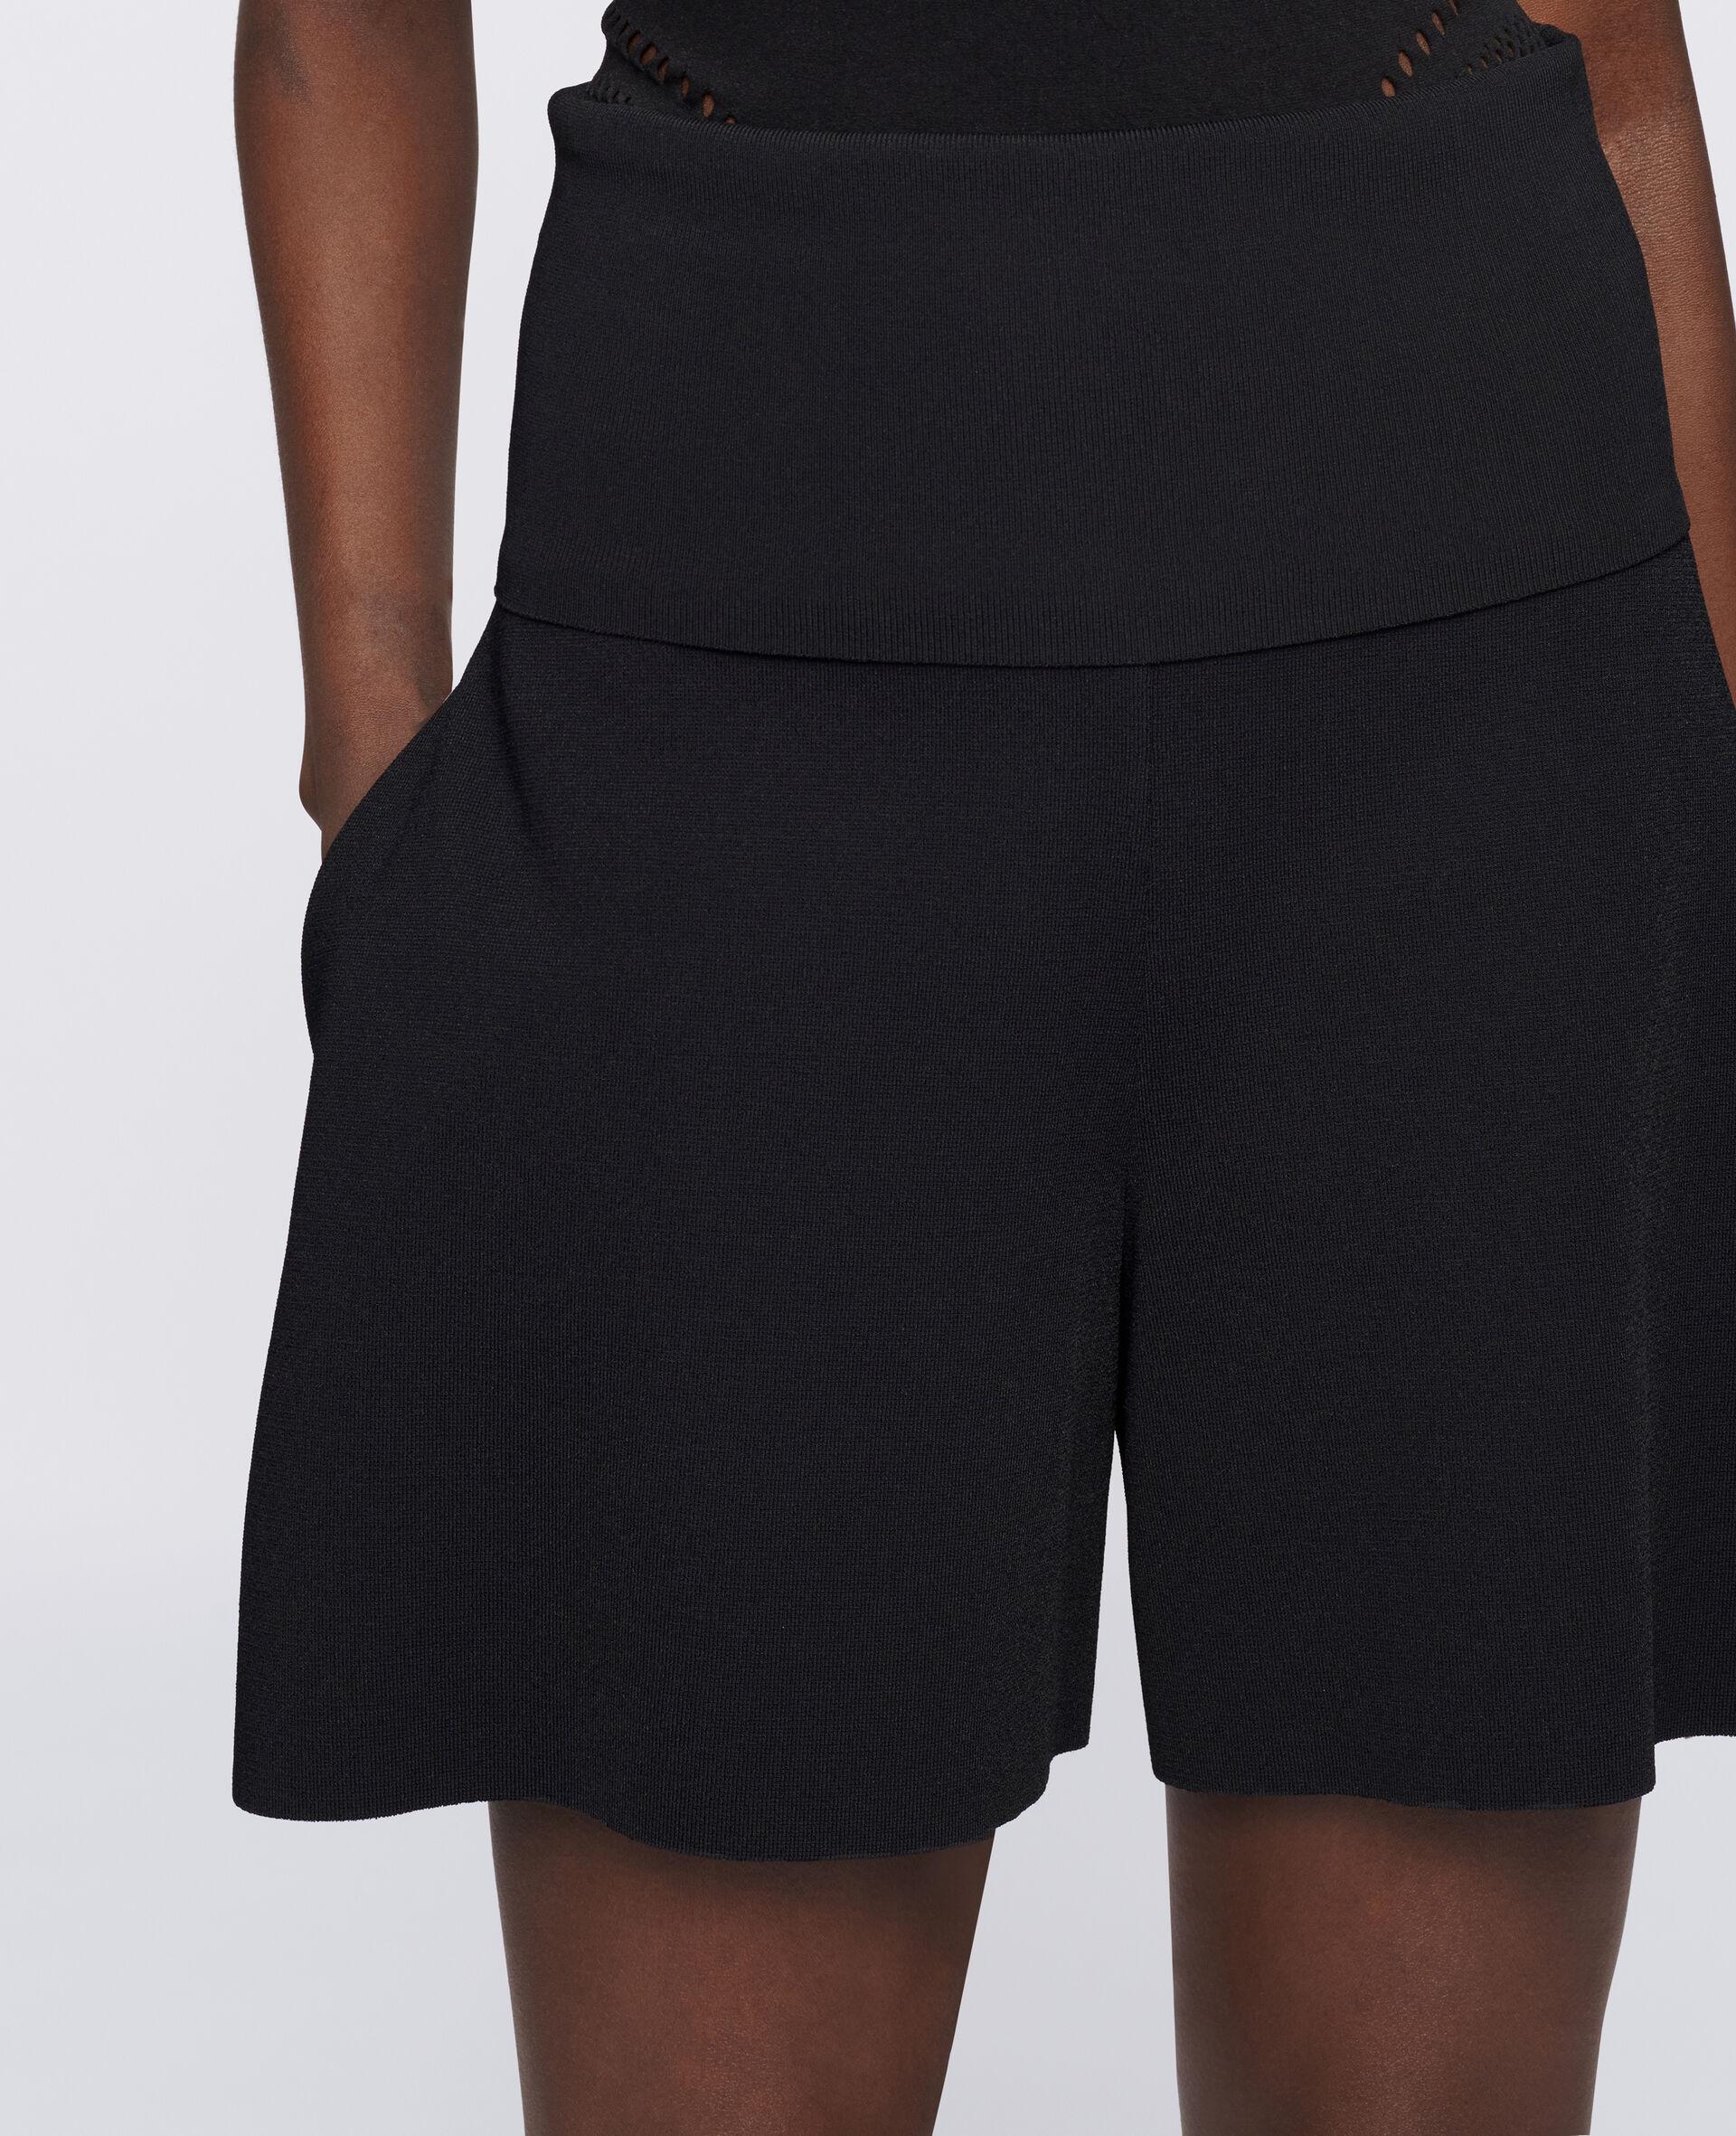 Shorts aus kompaktem Strick-Schwarz-large image number 3